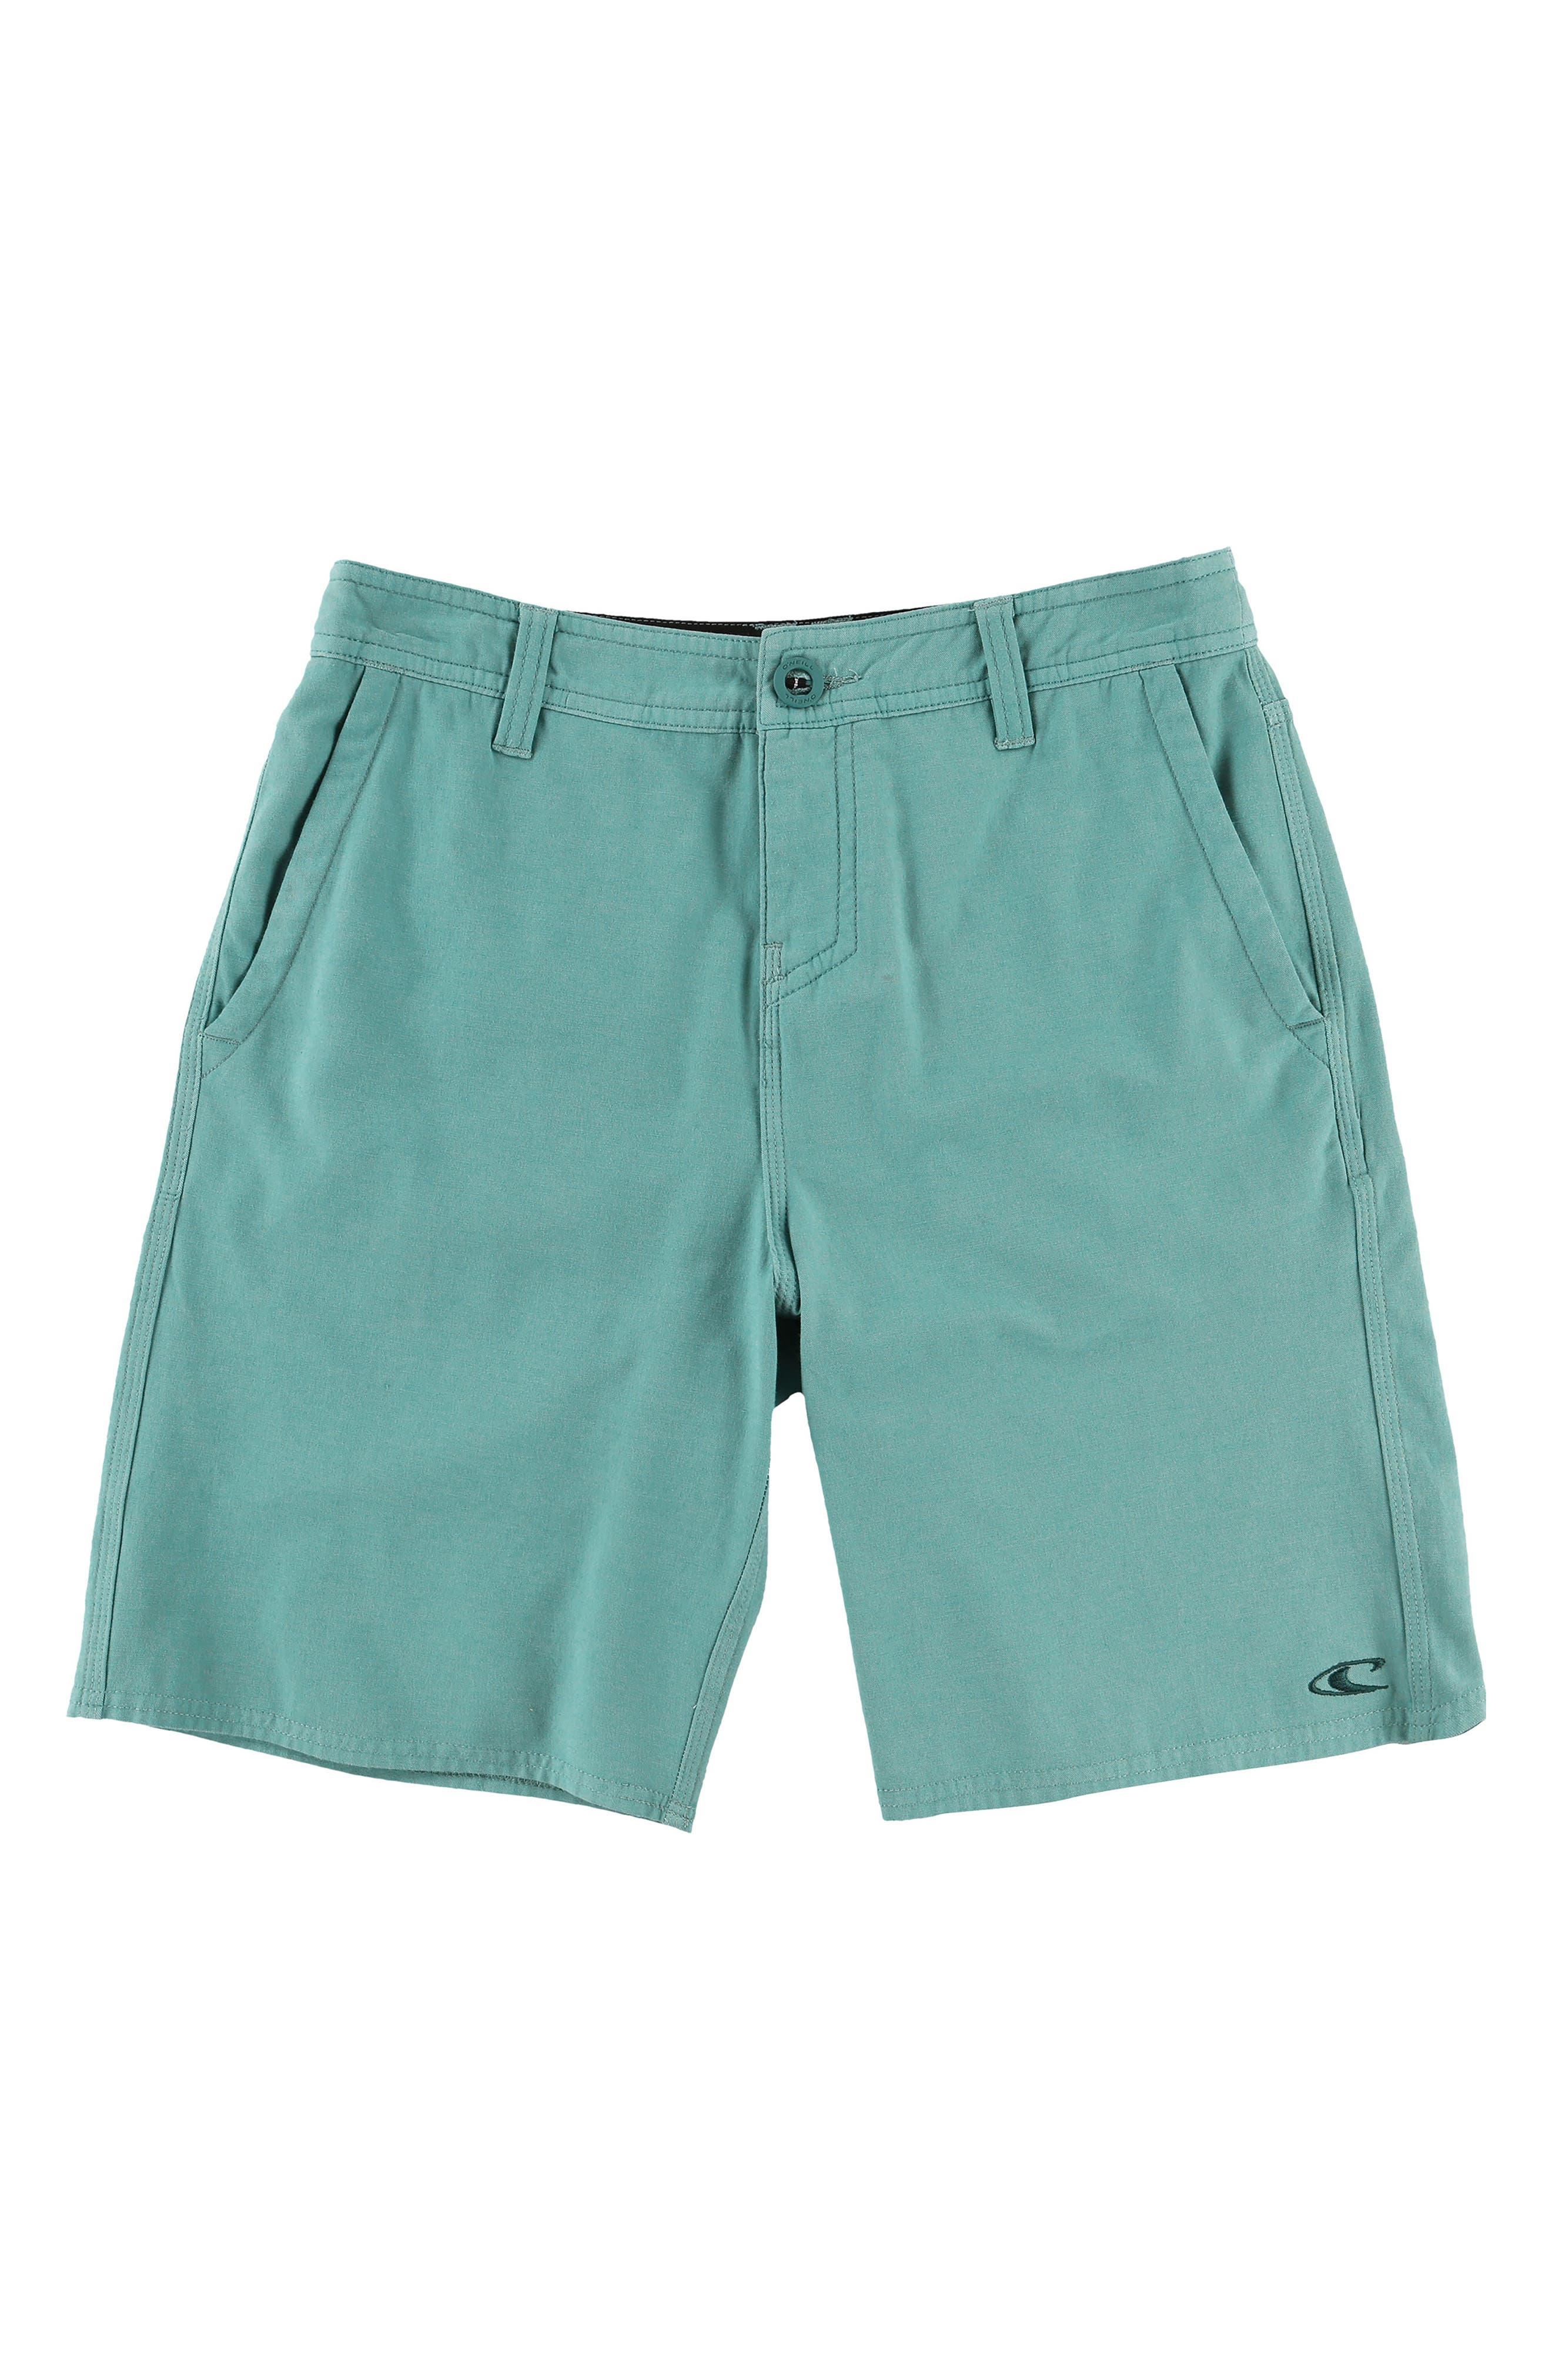 Locked Overdye Hybrid Shorts,                             Main thumbnail 2, color,